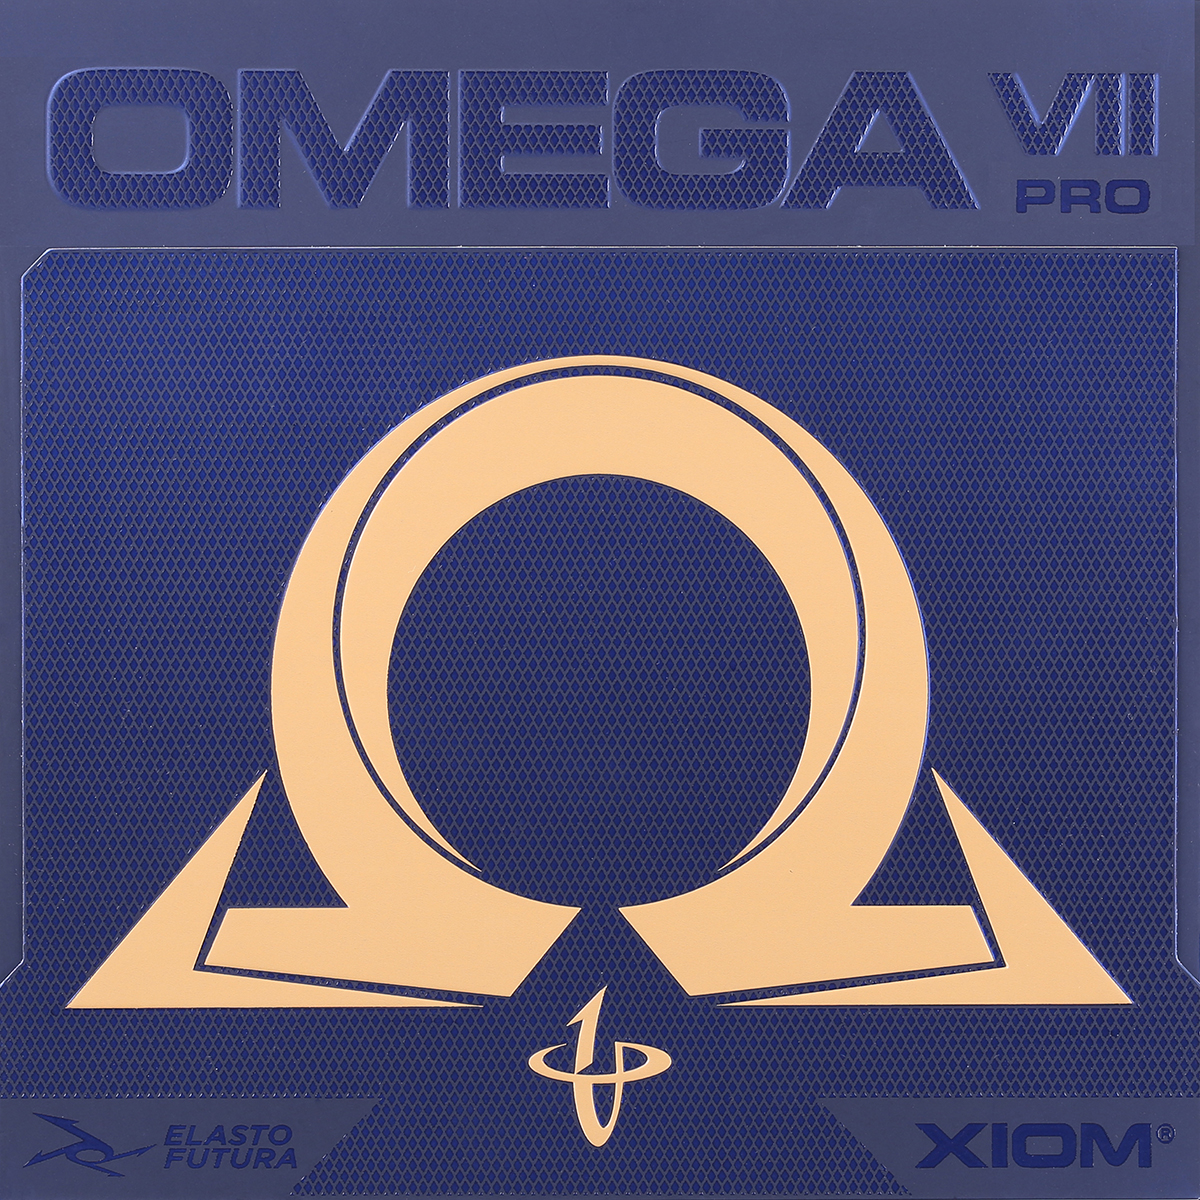 Xiom Omega VII Pro Table Tennis Rubber